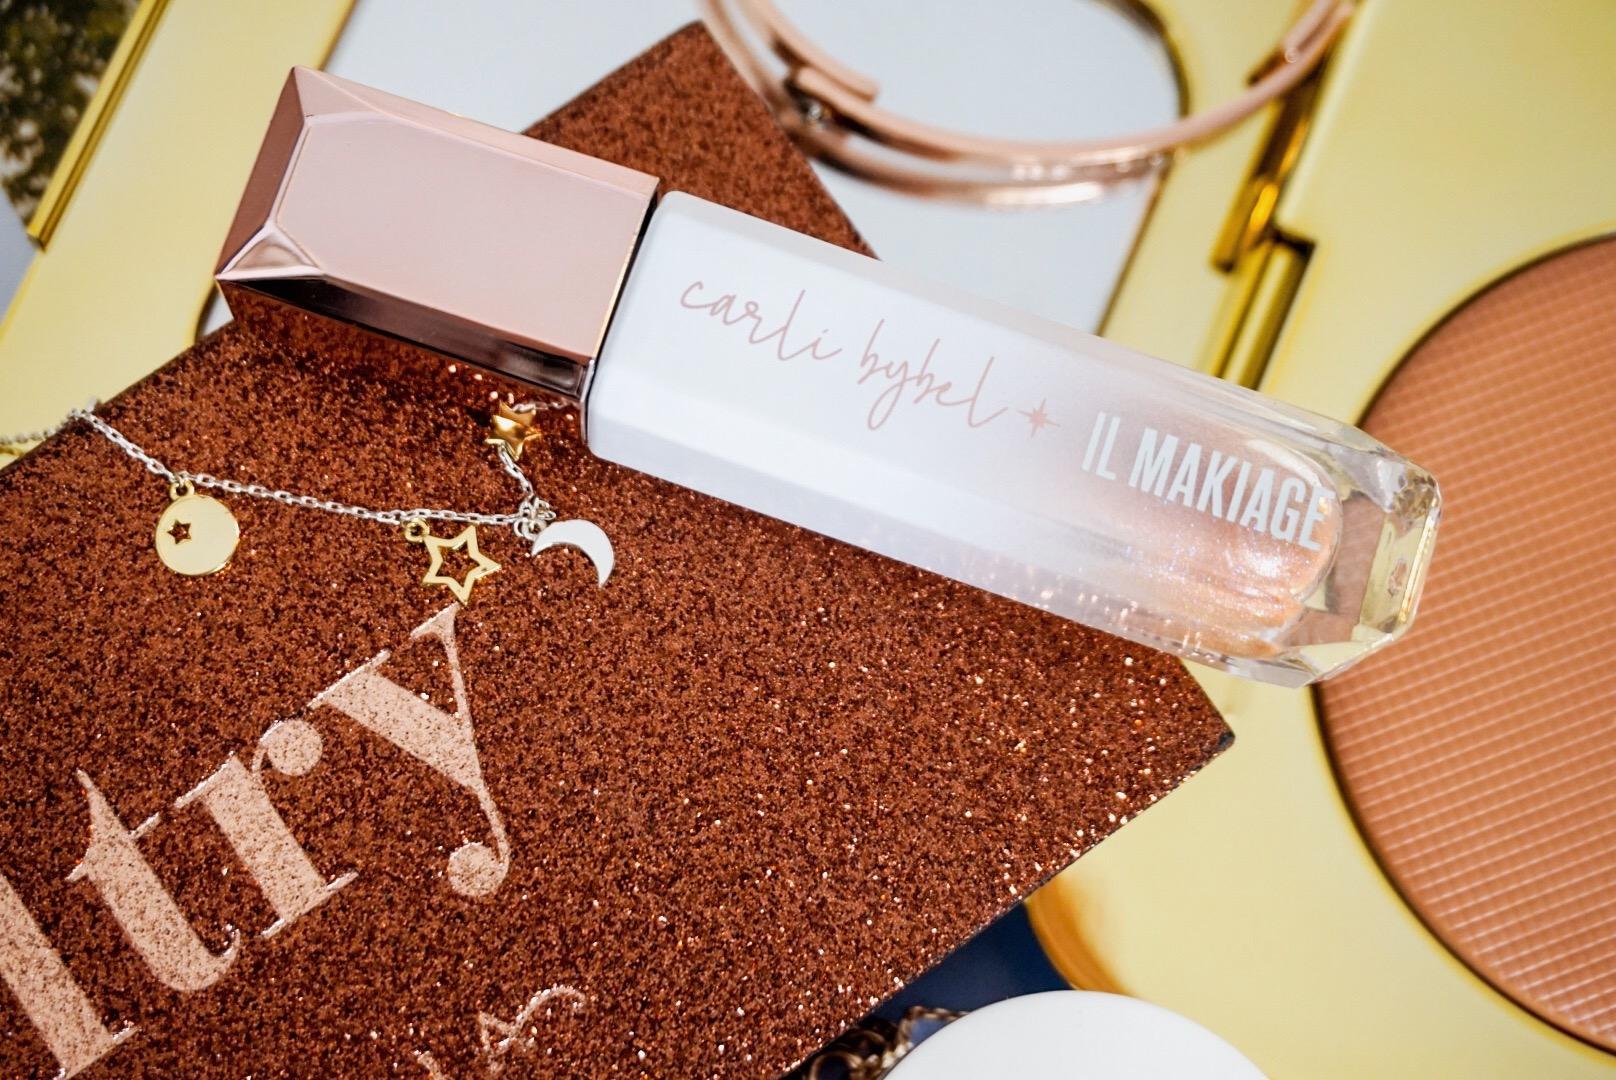 Yearlong Low Buy | Luxury Makeup Flatlay | Anastasia Beverly Hills, Estee Lauder, Il Makiage, JD Glow, Nars, Shiseido, Tom Ford | Il Makiage x Carli Bybel Hi-Shine Lip Glaze in Star Child